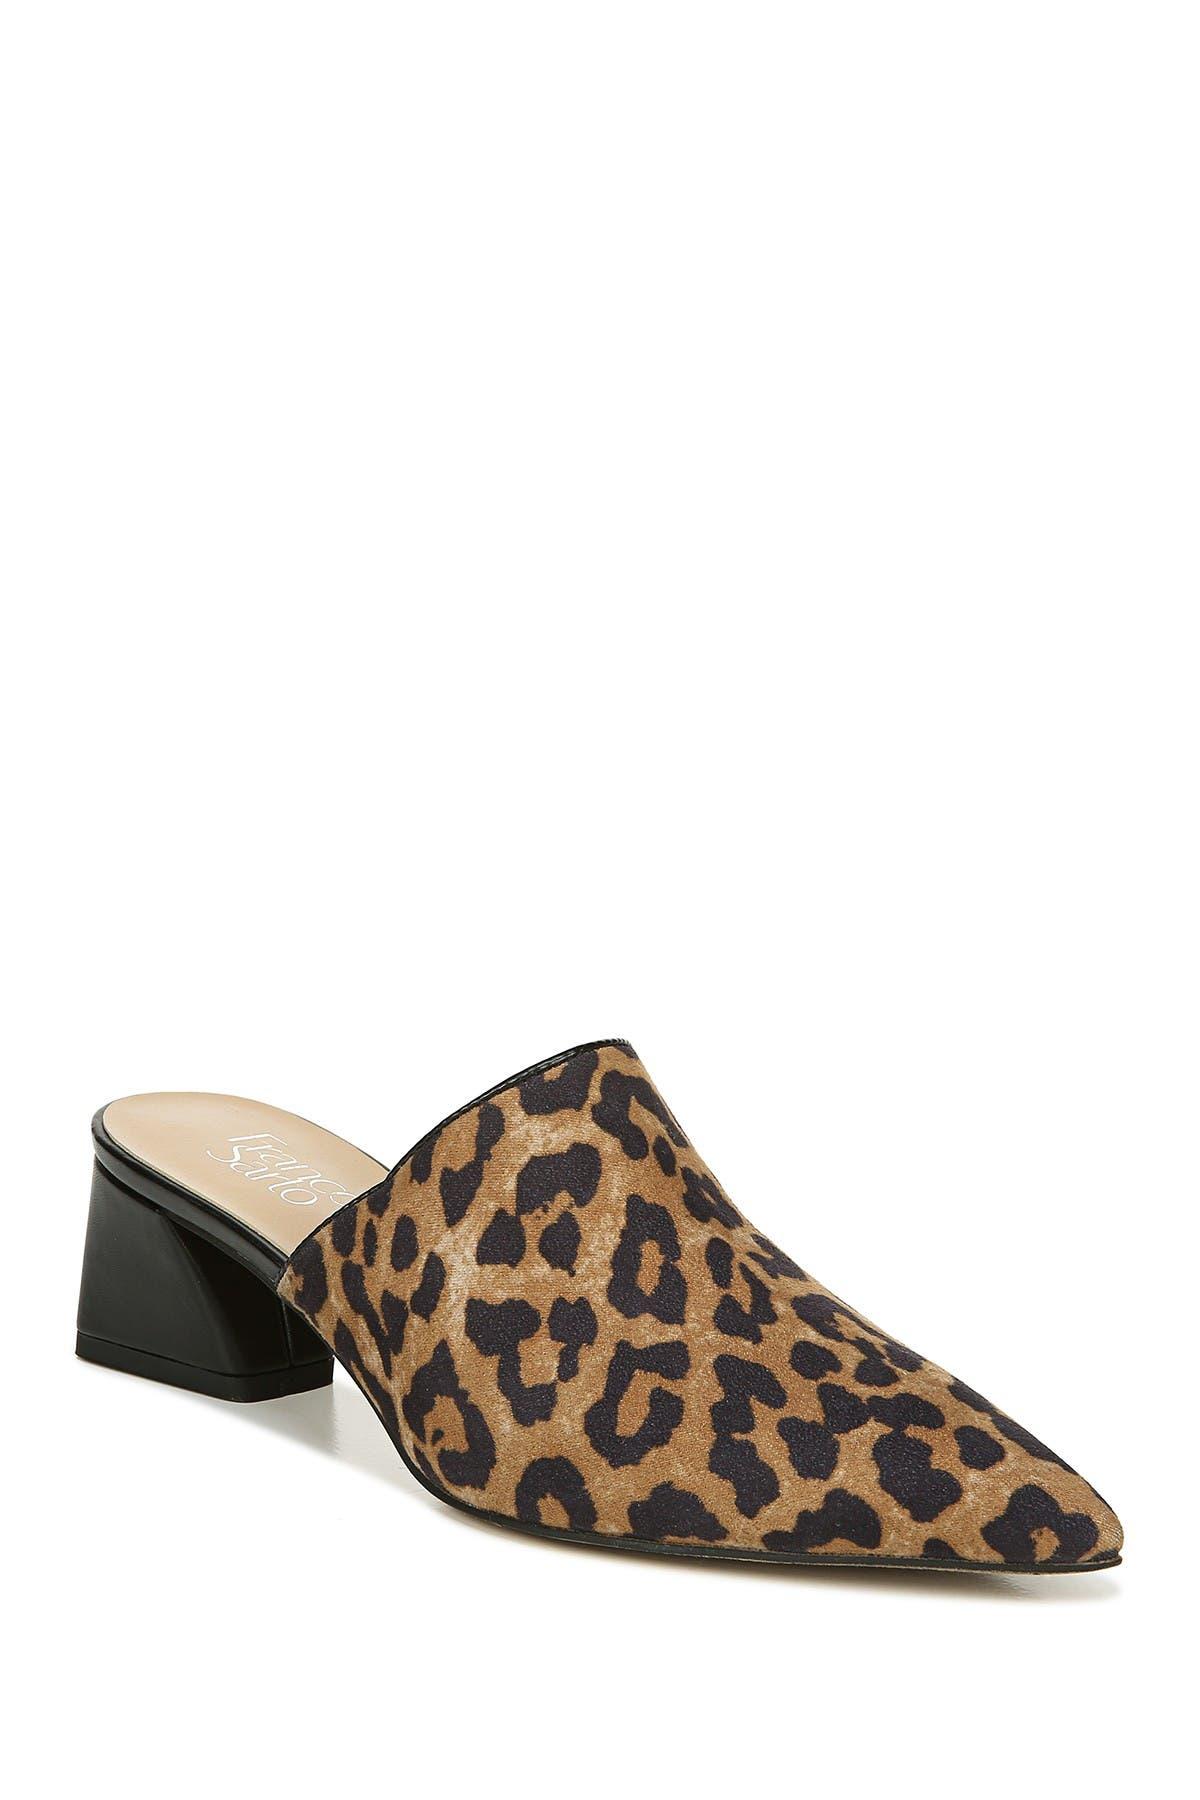 Rianan Leopard Print Block Heel Mule